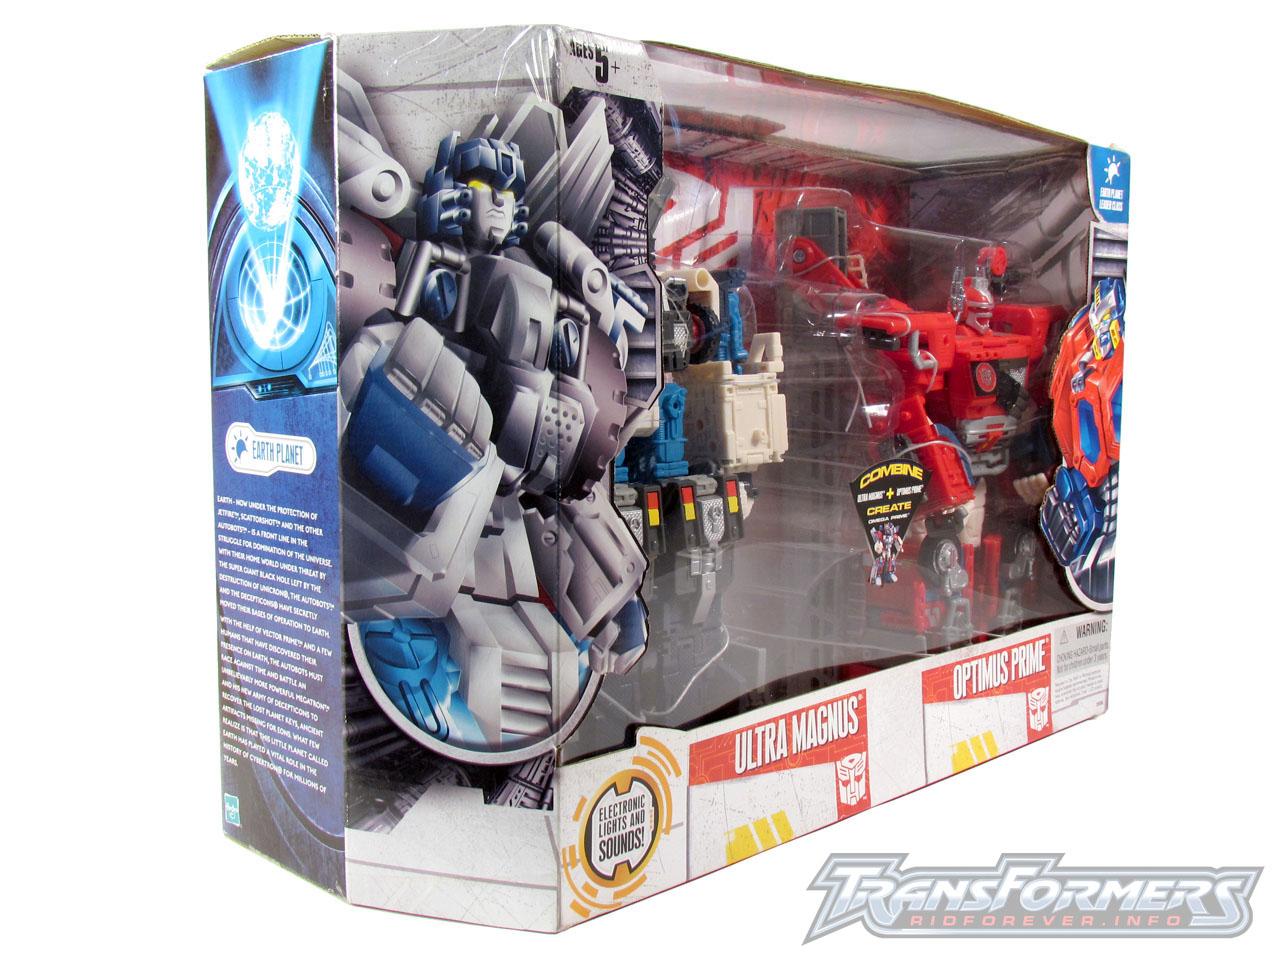 Cybertron-Omega-Prime-002